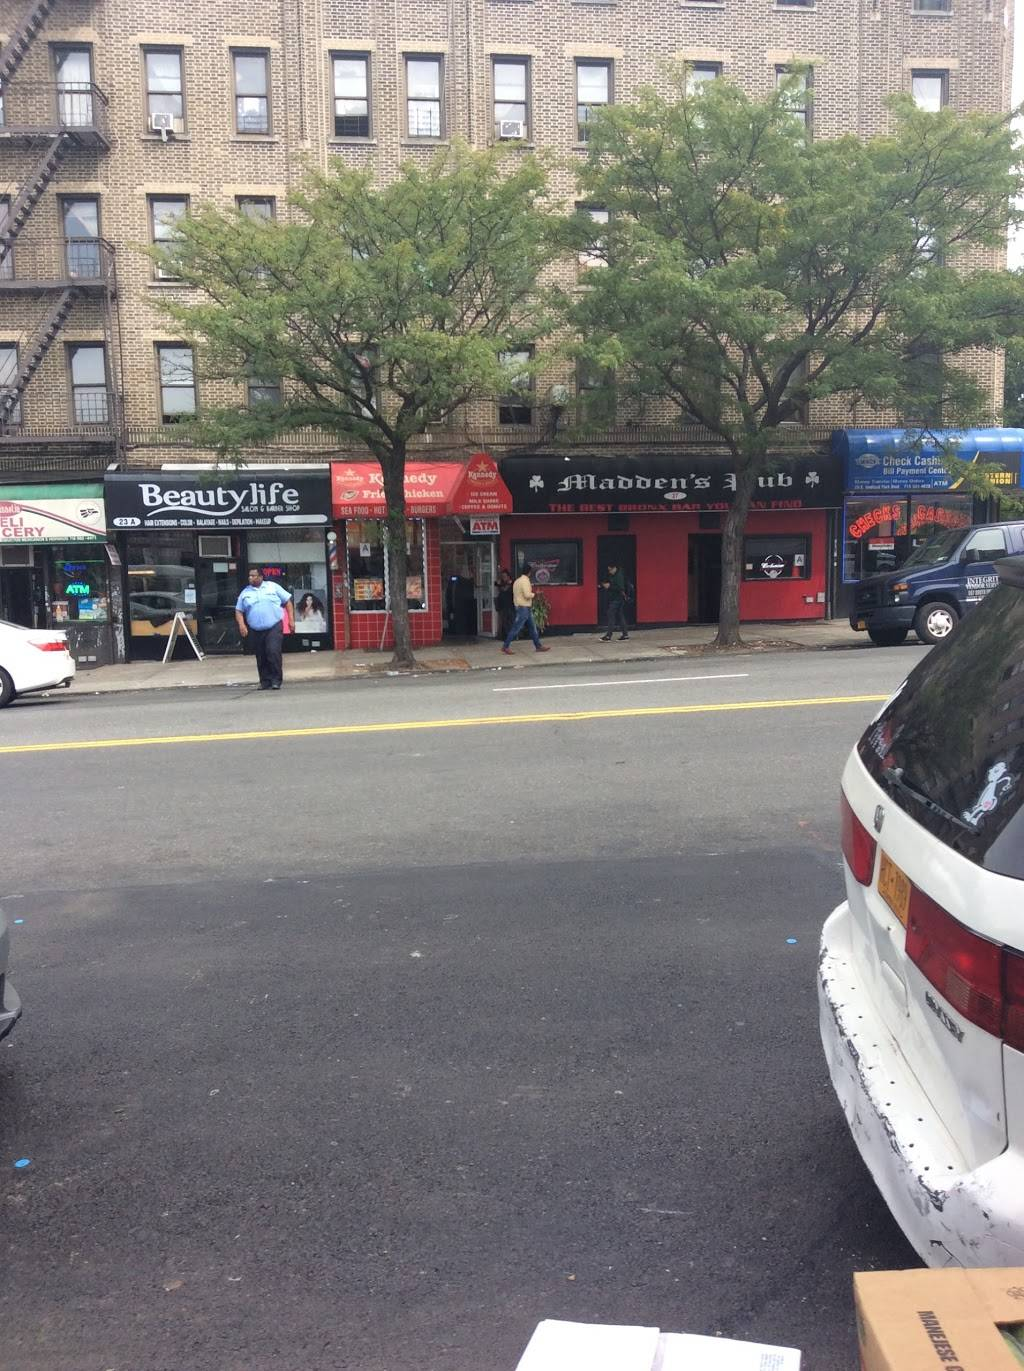 Kennedy Fried Chicken | restaurant | 25 Bedford Park Blvd, Bronx, NY 10468, USA | 7186846364 OR +1 718-684-6364